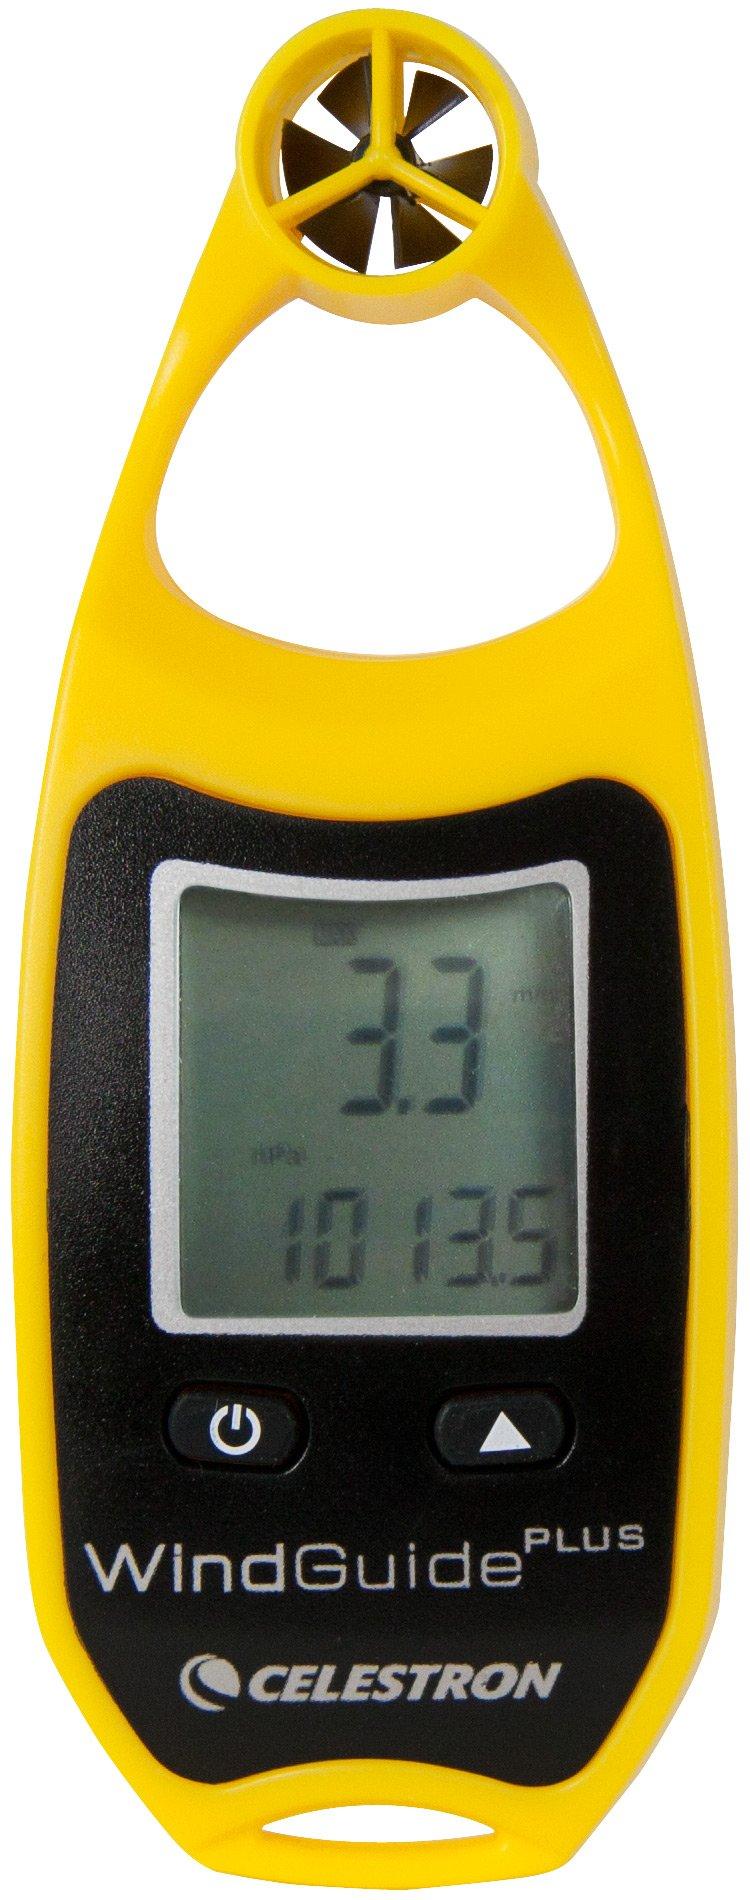 Celestron 48025 Windguide Plus (Yellow)